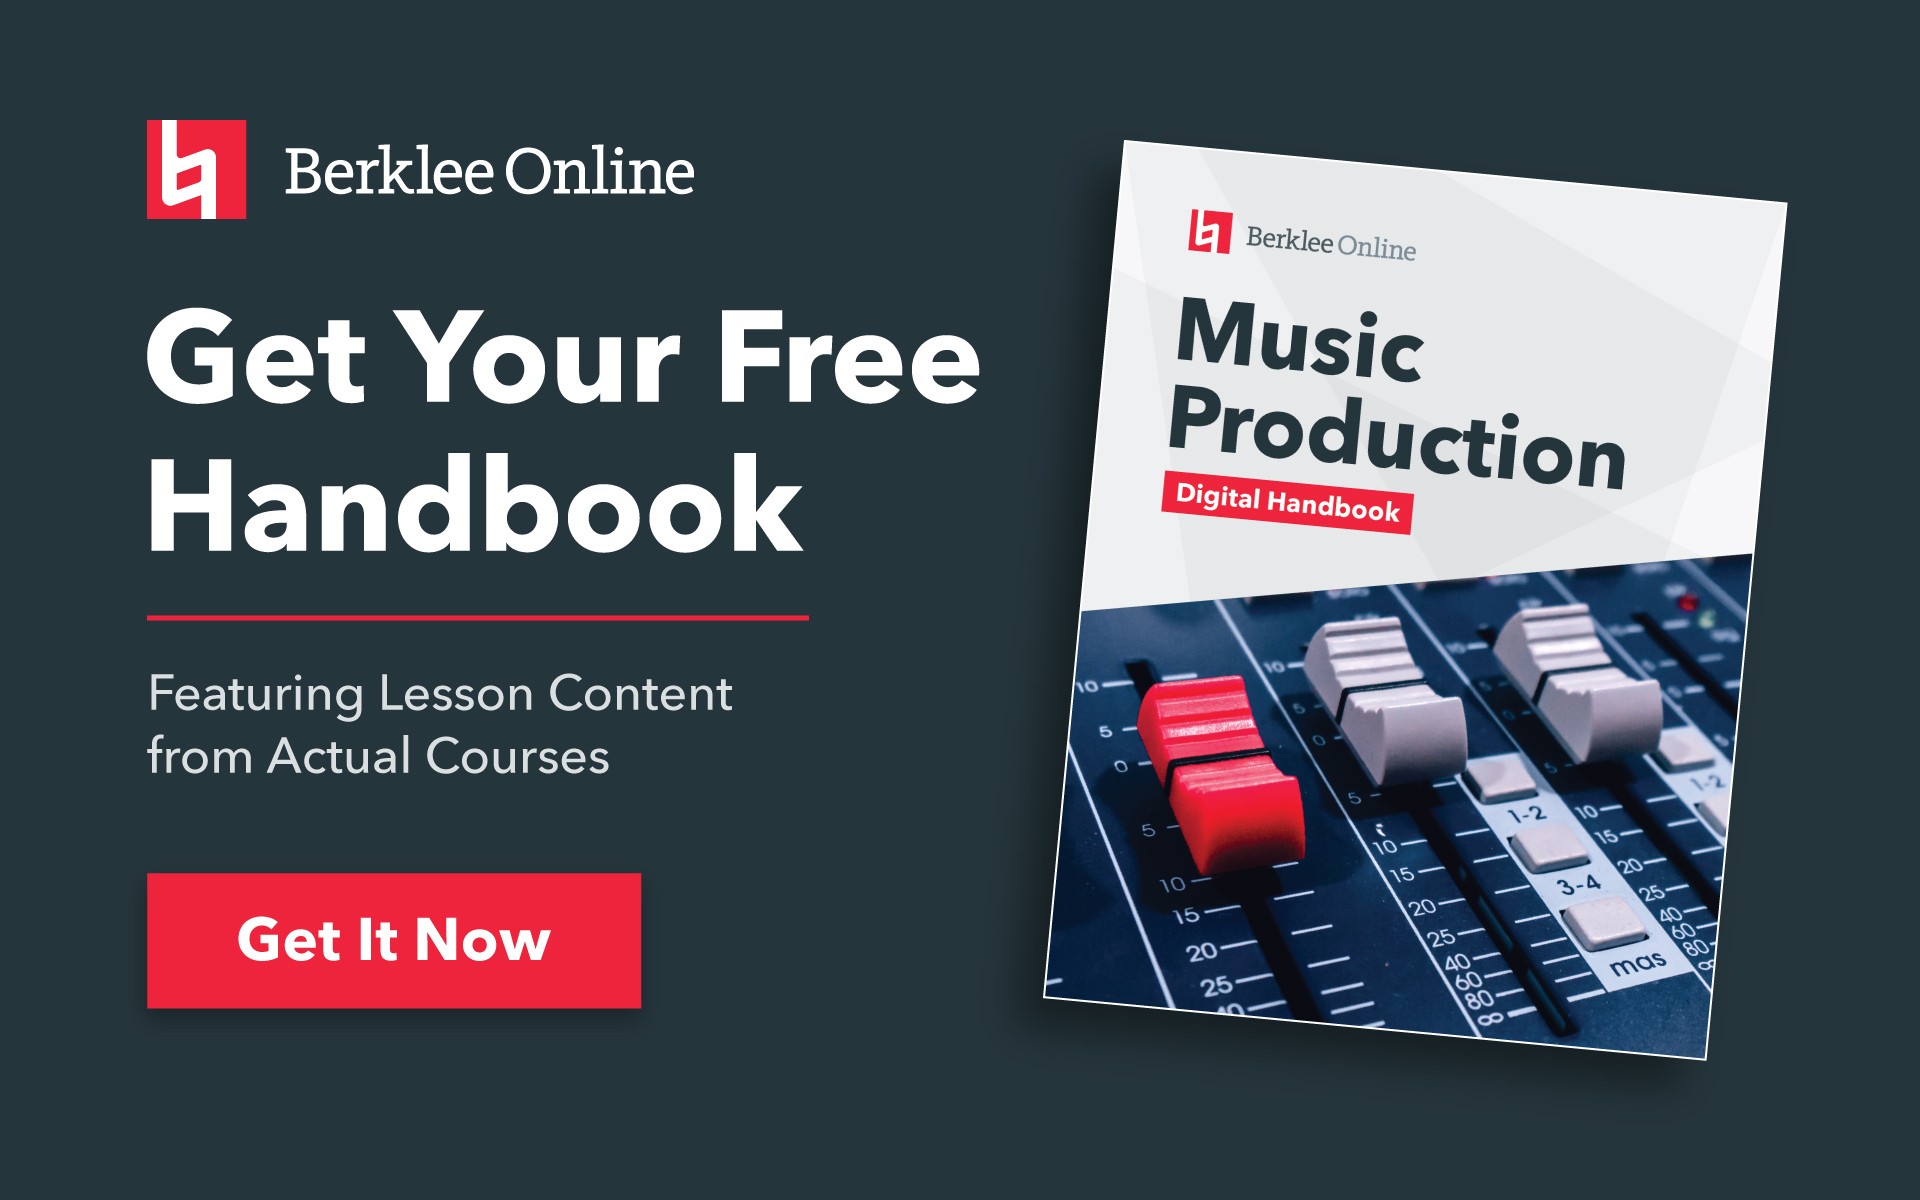 Get your free music production handbook from Berklee Online.